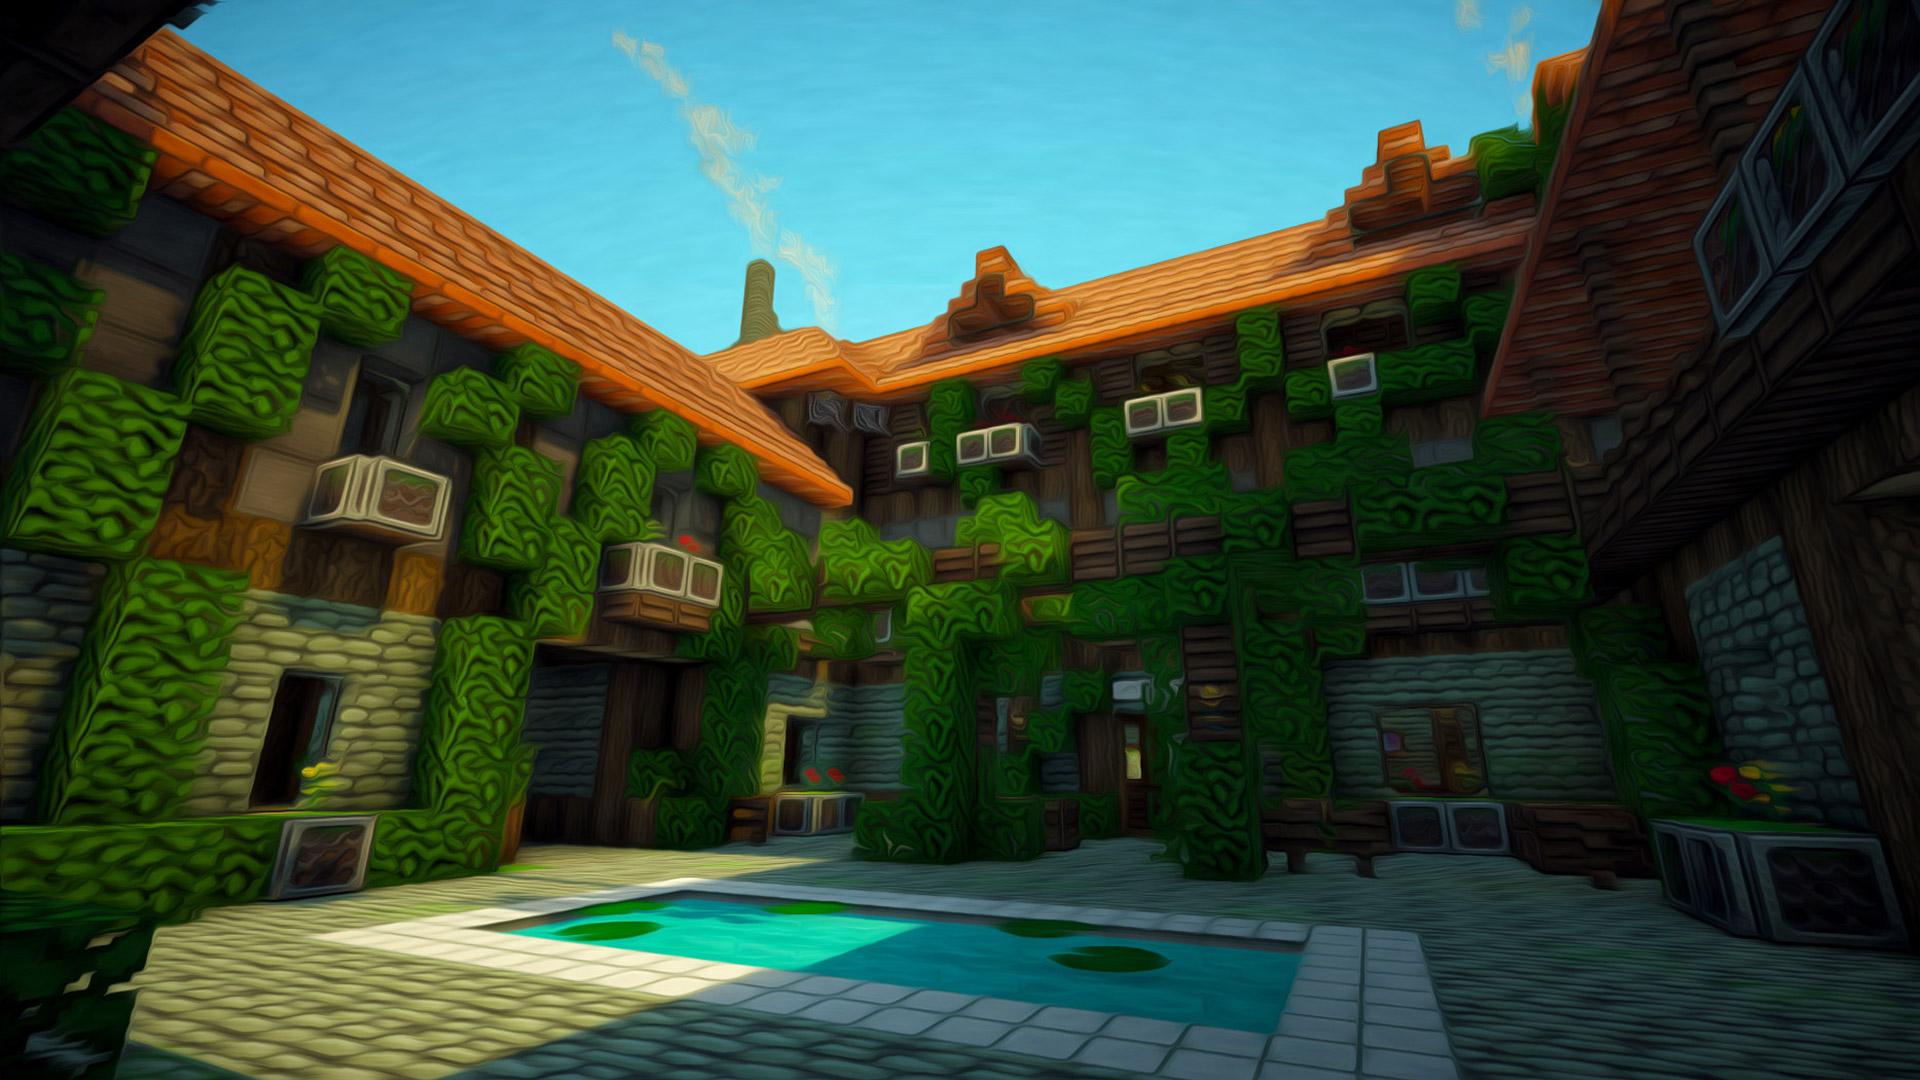 minecraft wallpaper,biome,building,house,screenshot,adventure game